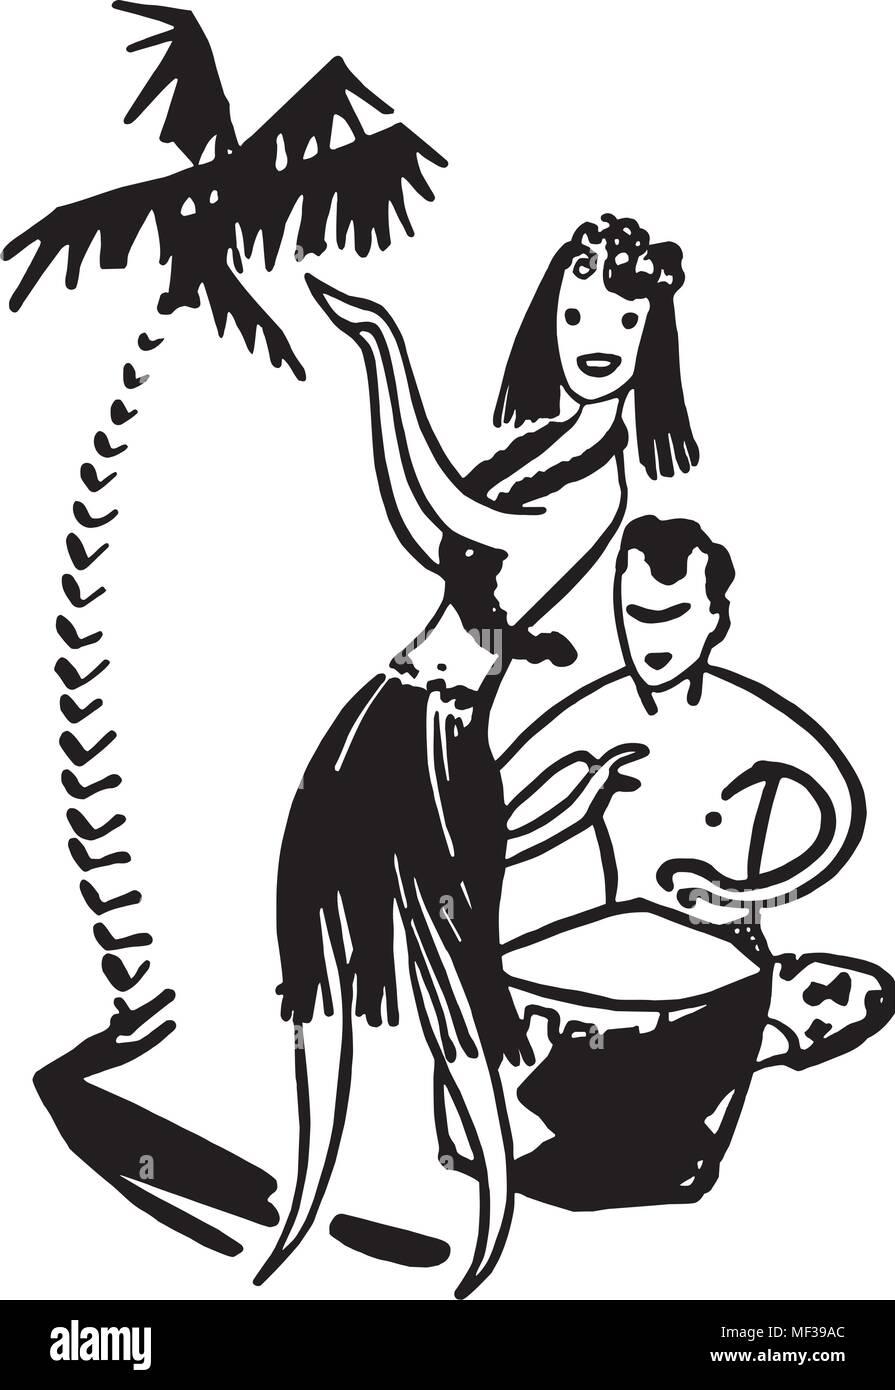 Hawaiian Couple - Retro Clipart Illustration - Stock Image